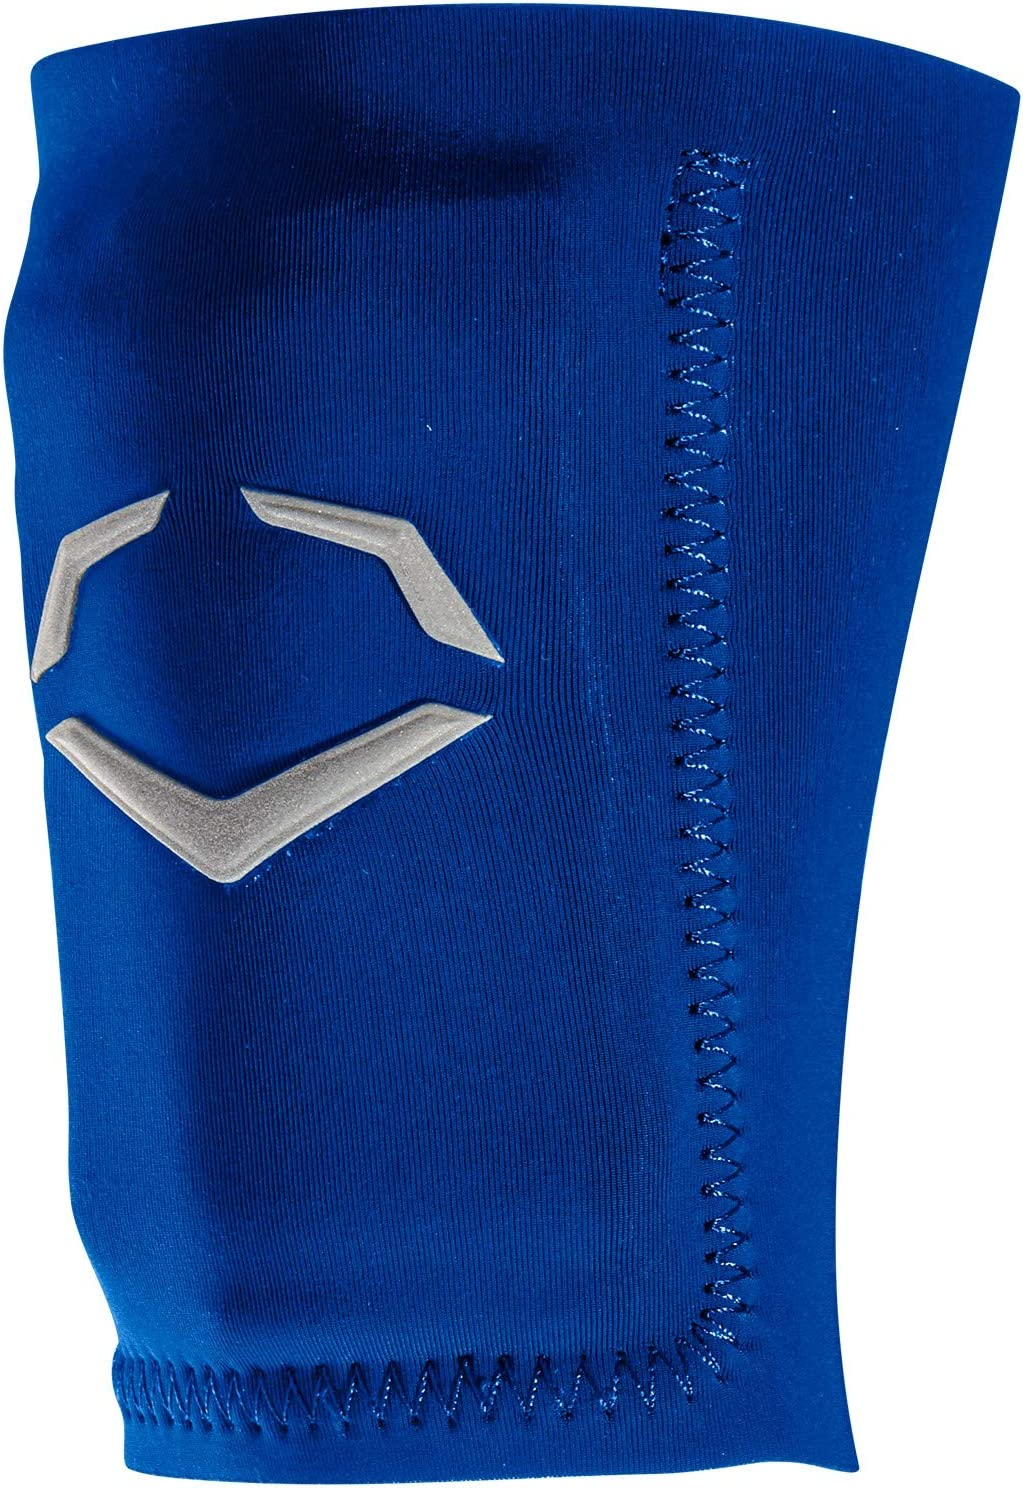 Evoshield Unisex-Adult X-Large Wrist Guard